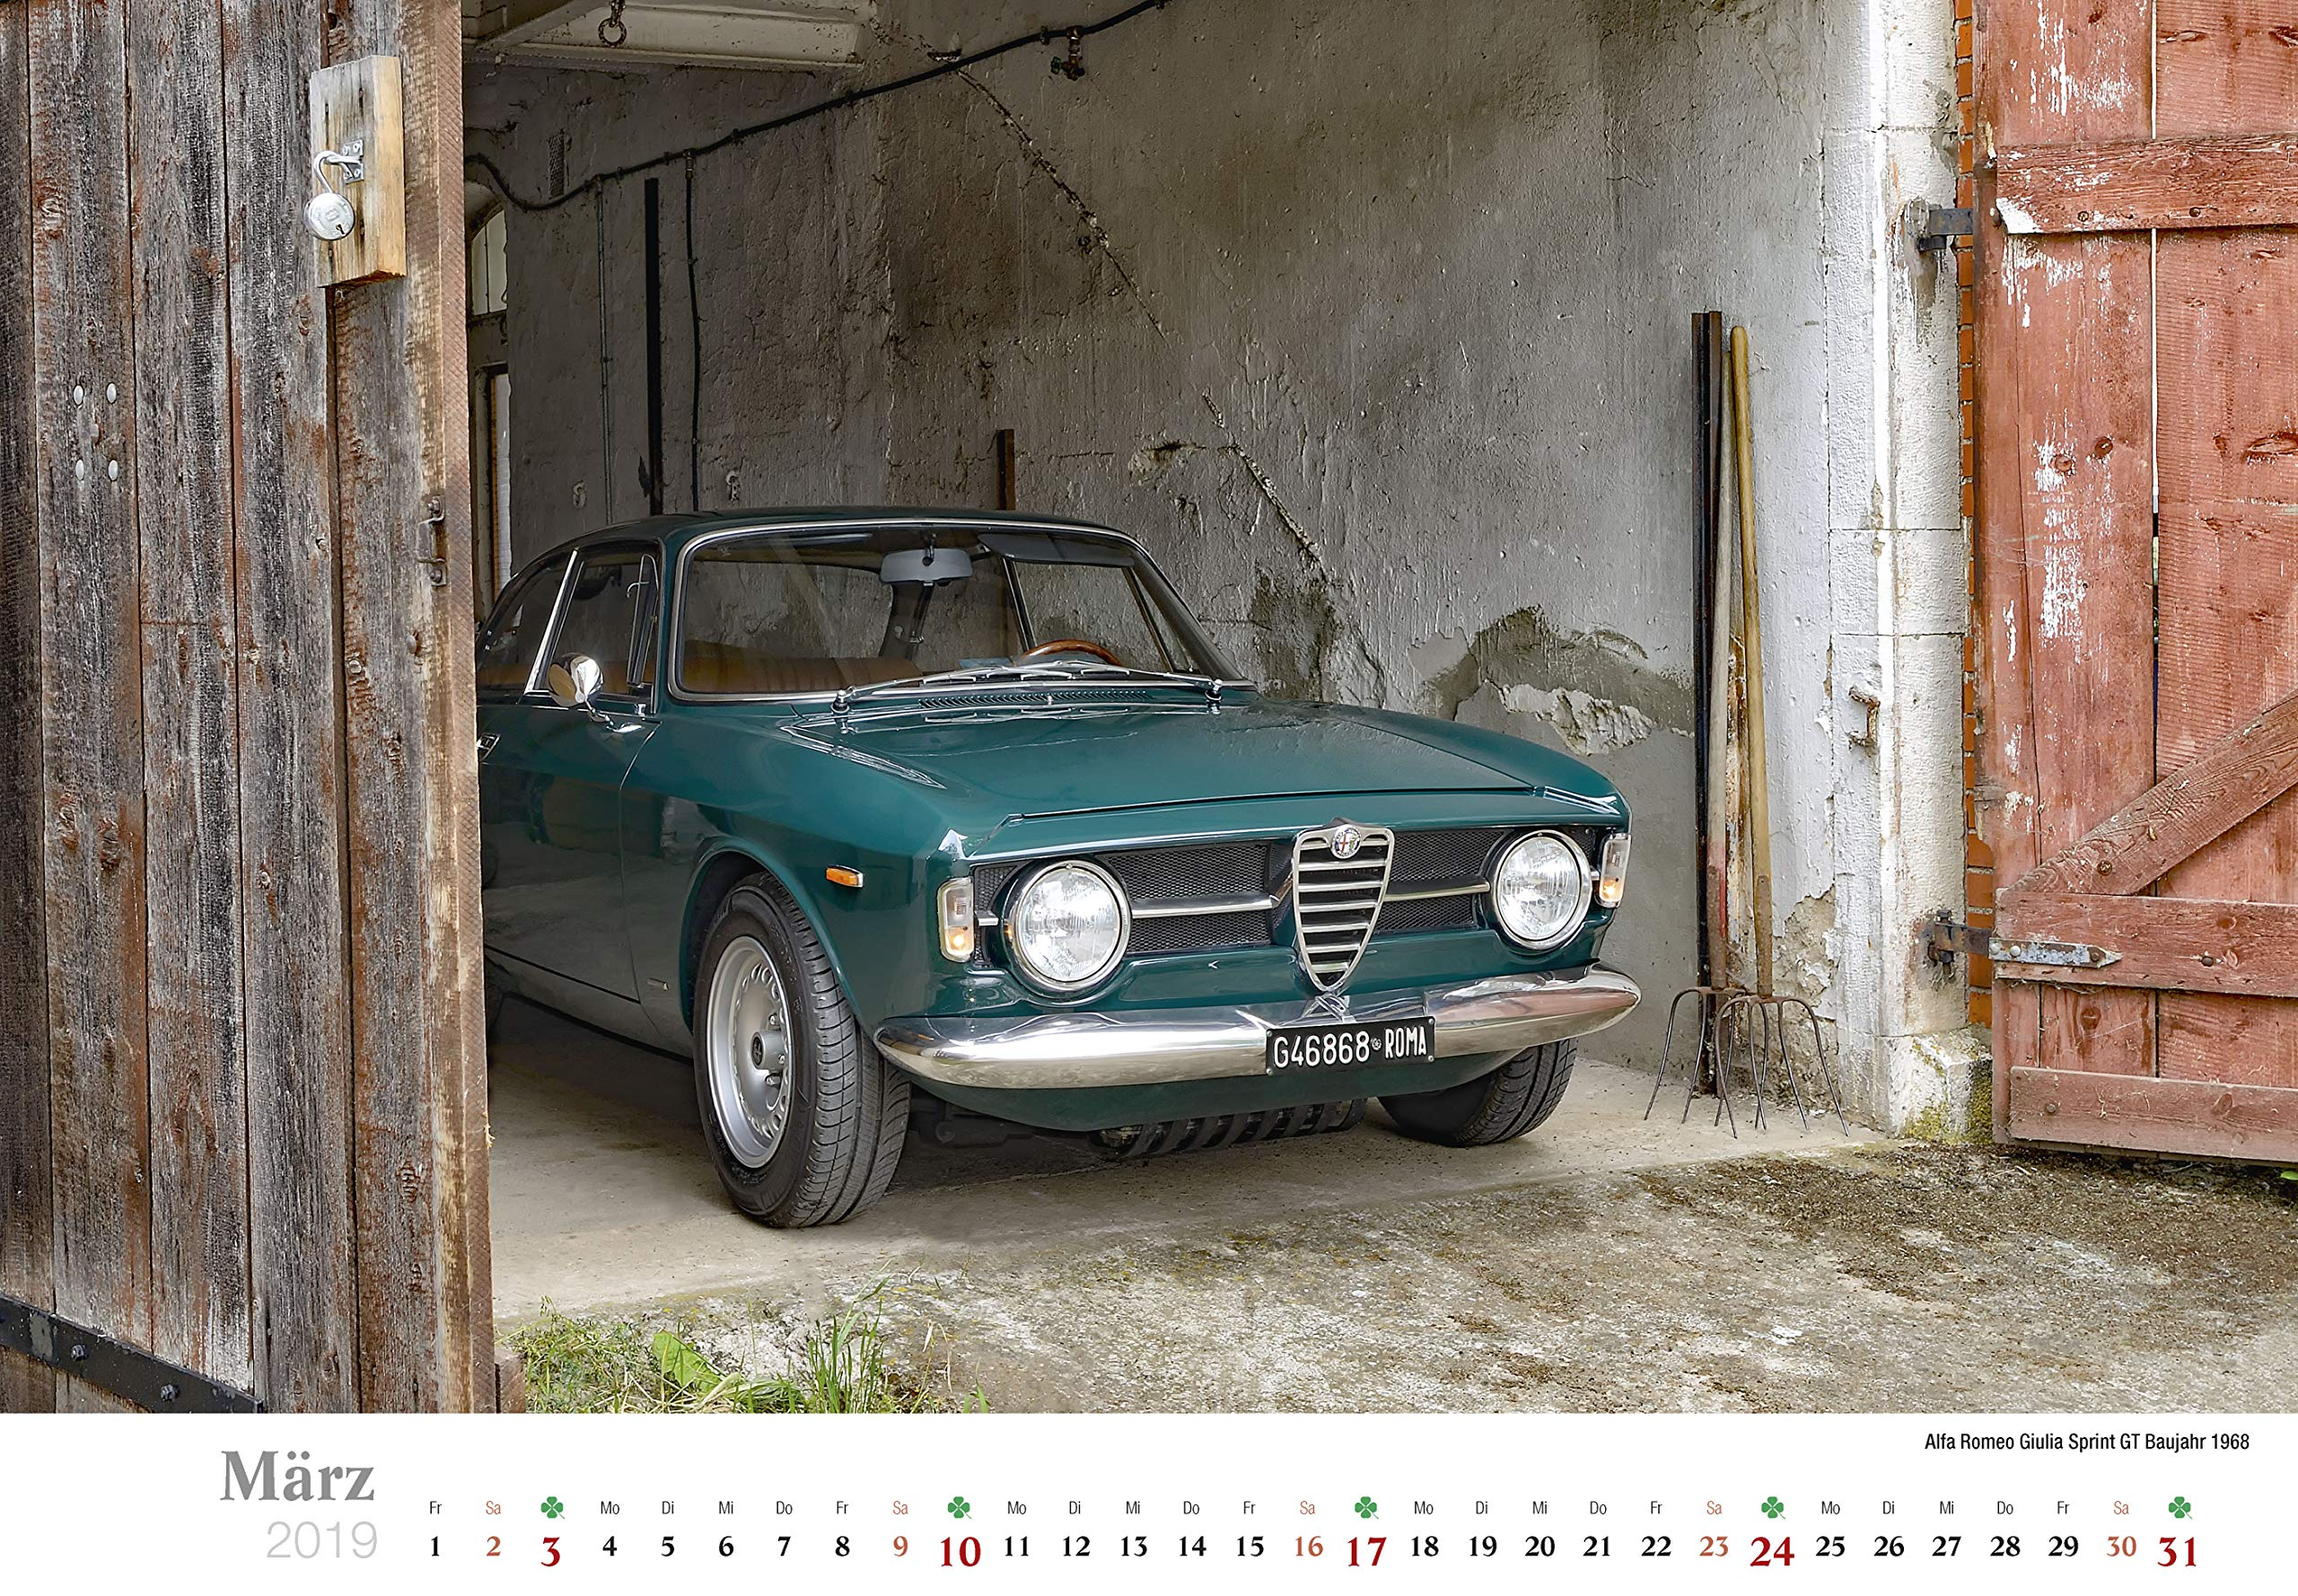 Alfa Romeo 2019: Der Kalender für Alfisti: Amazon.es: Jörg Hajt: Libros en idiomas extranjeros